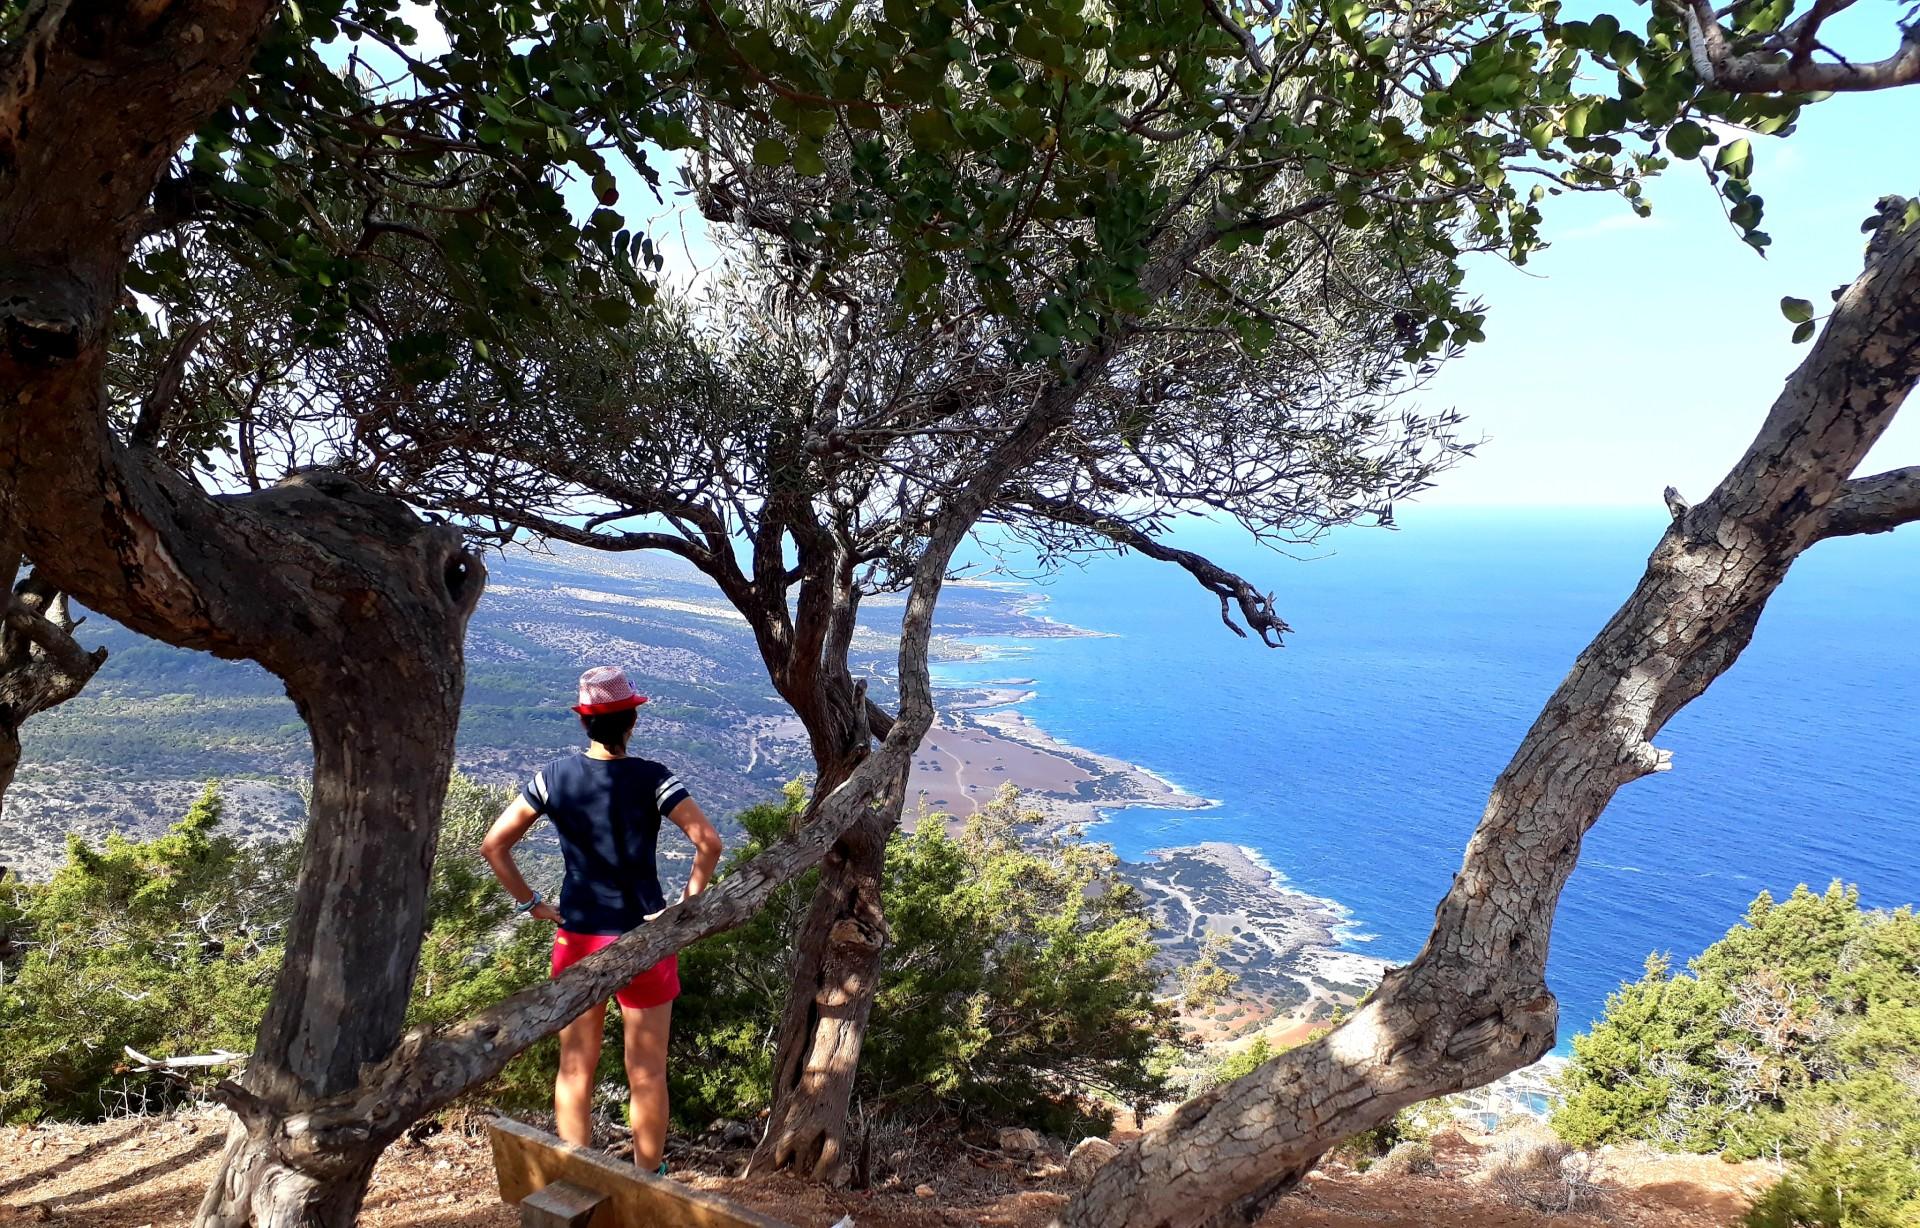 Jacqueline op Aphrodite Trail, uitzicht Akamas, Cyprus